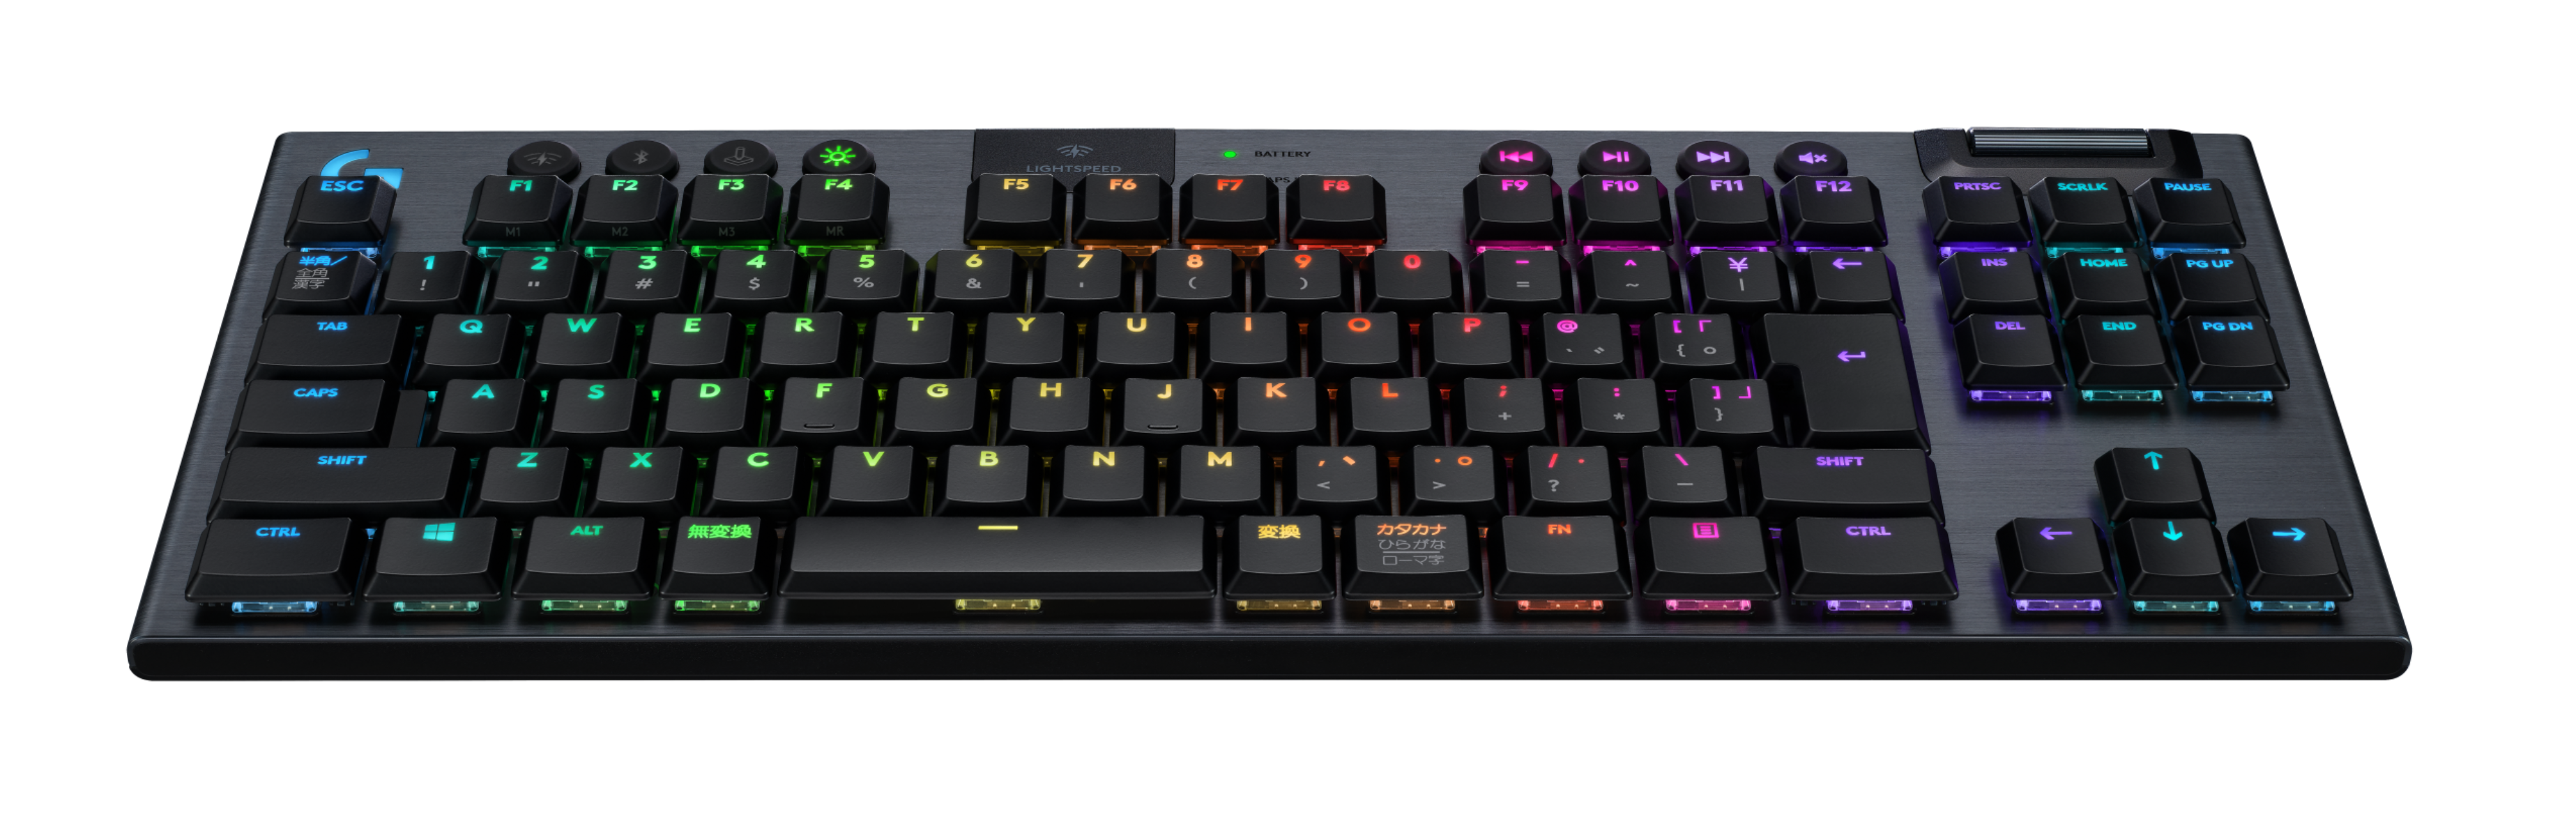 tastiera gaming g913 TKL